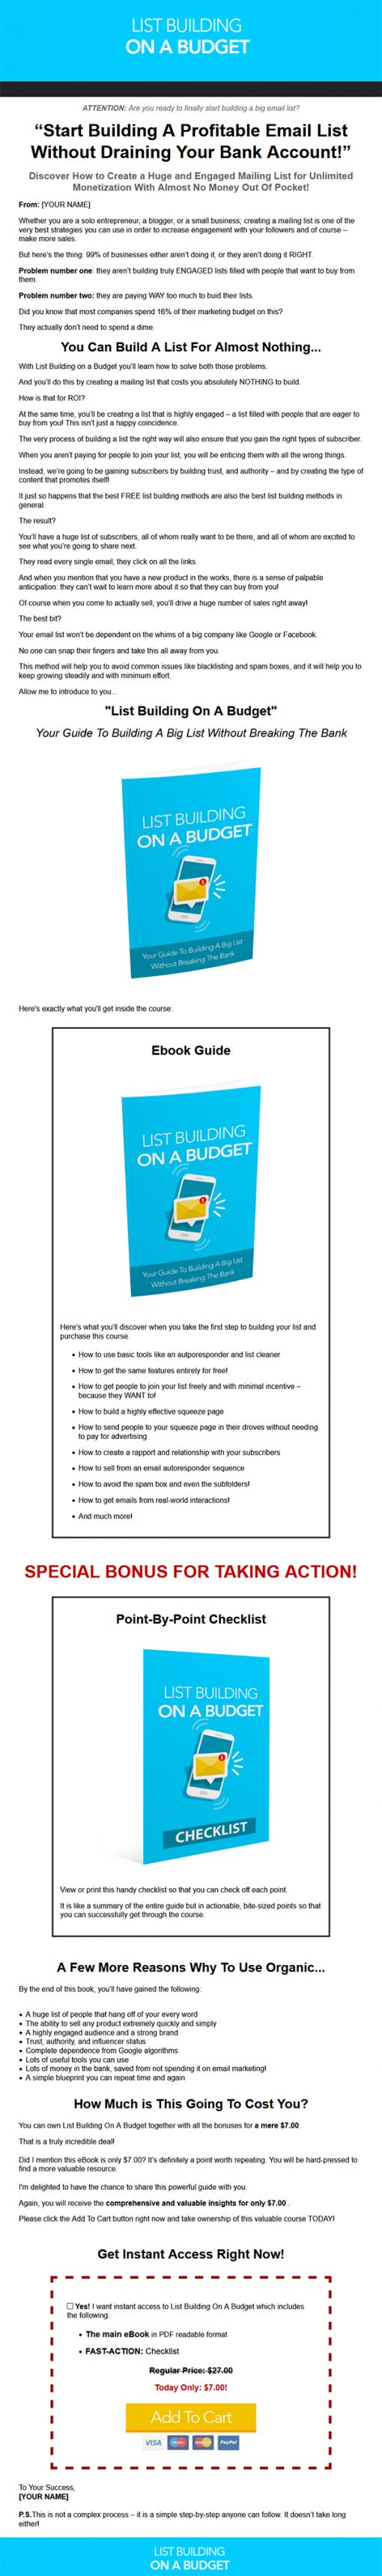 List Building on a Budget Ebook MRR